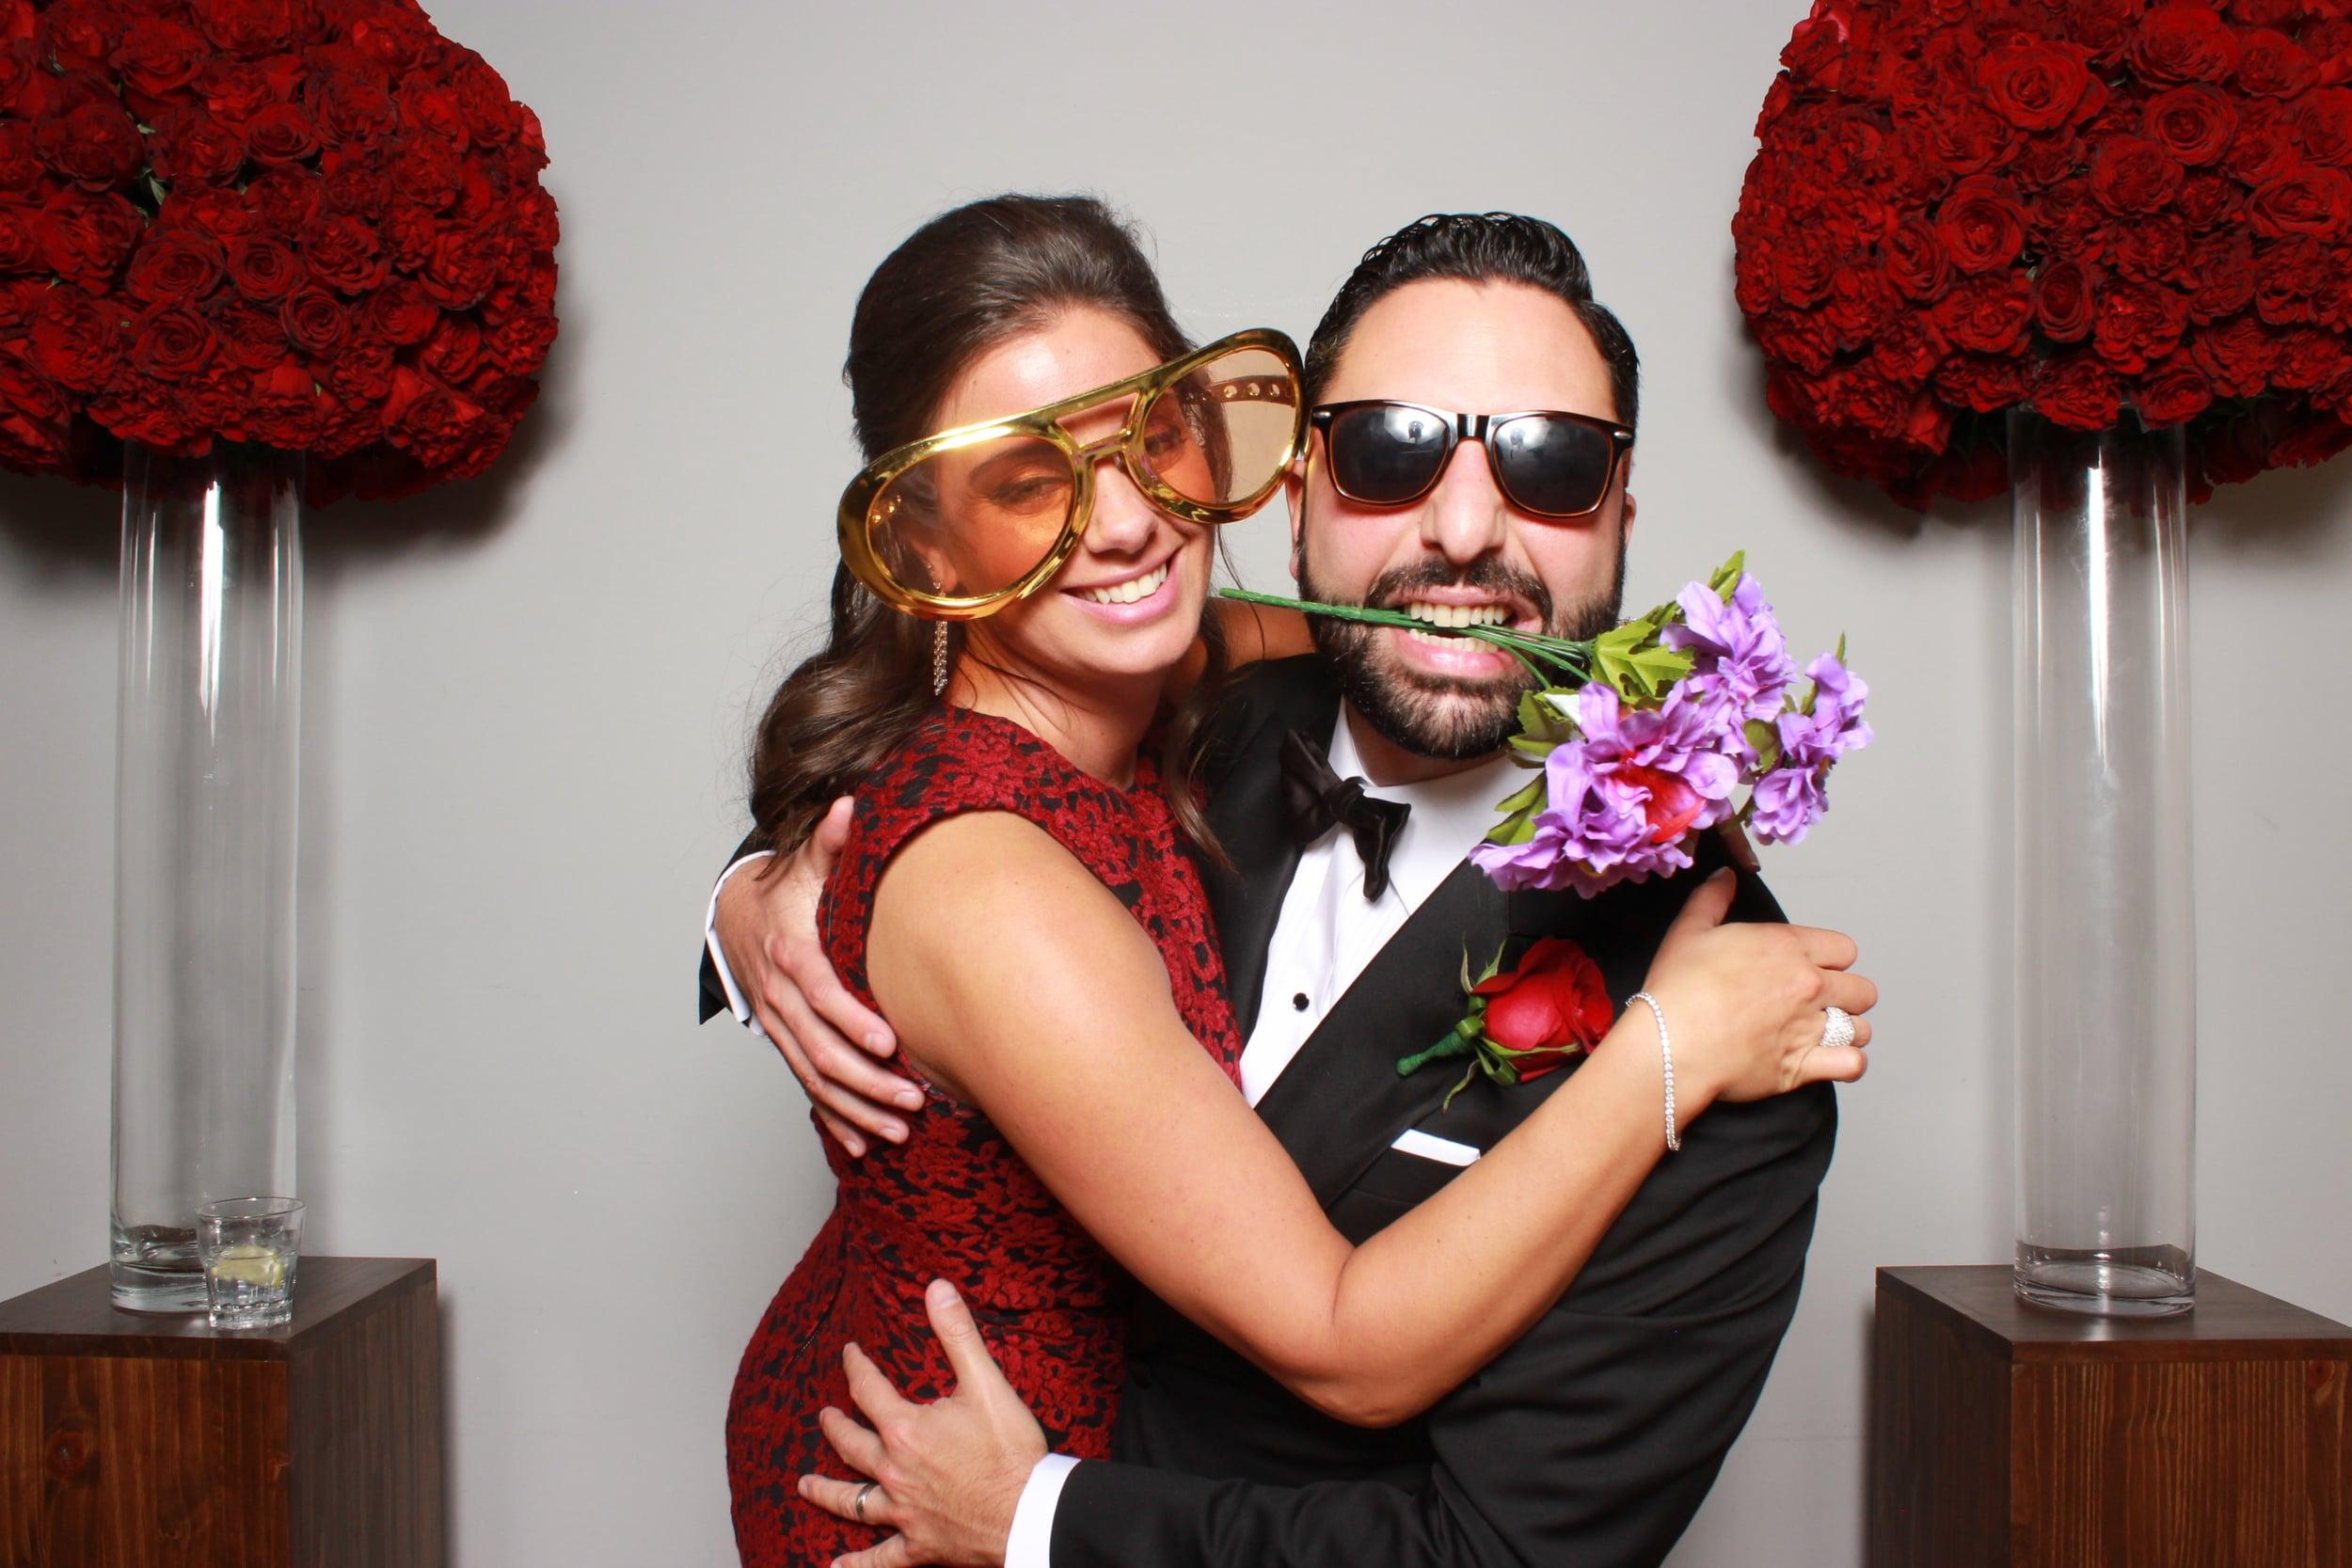 ottawa-wedding-photobooth-57.JPG